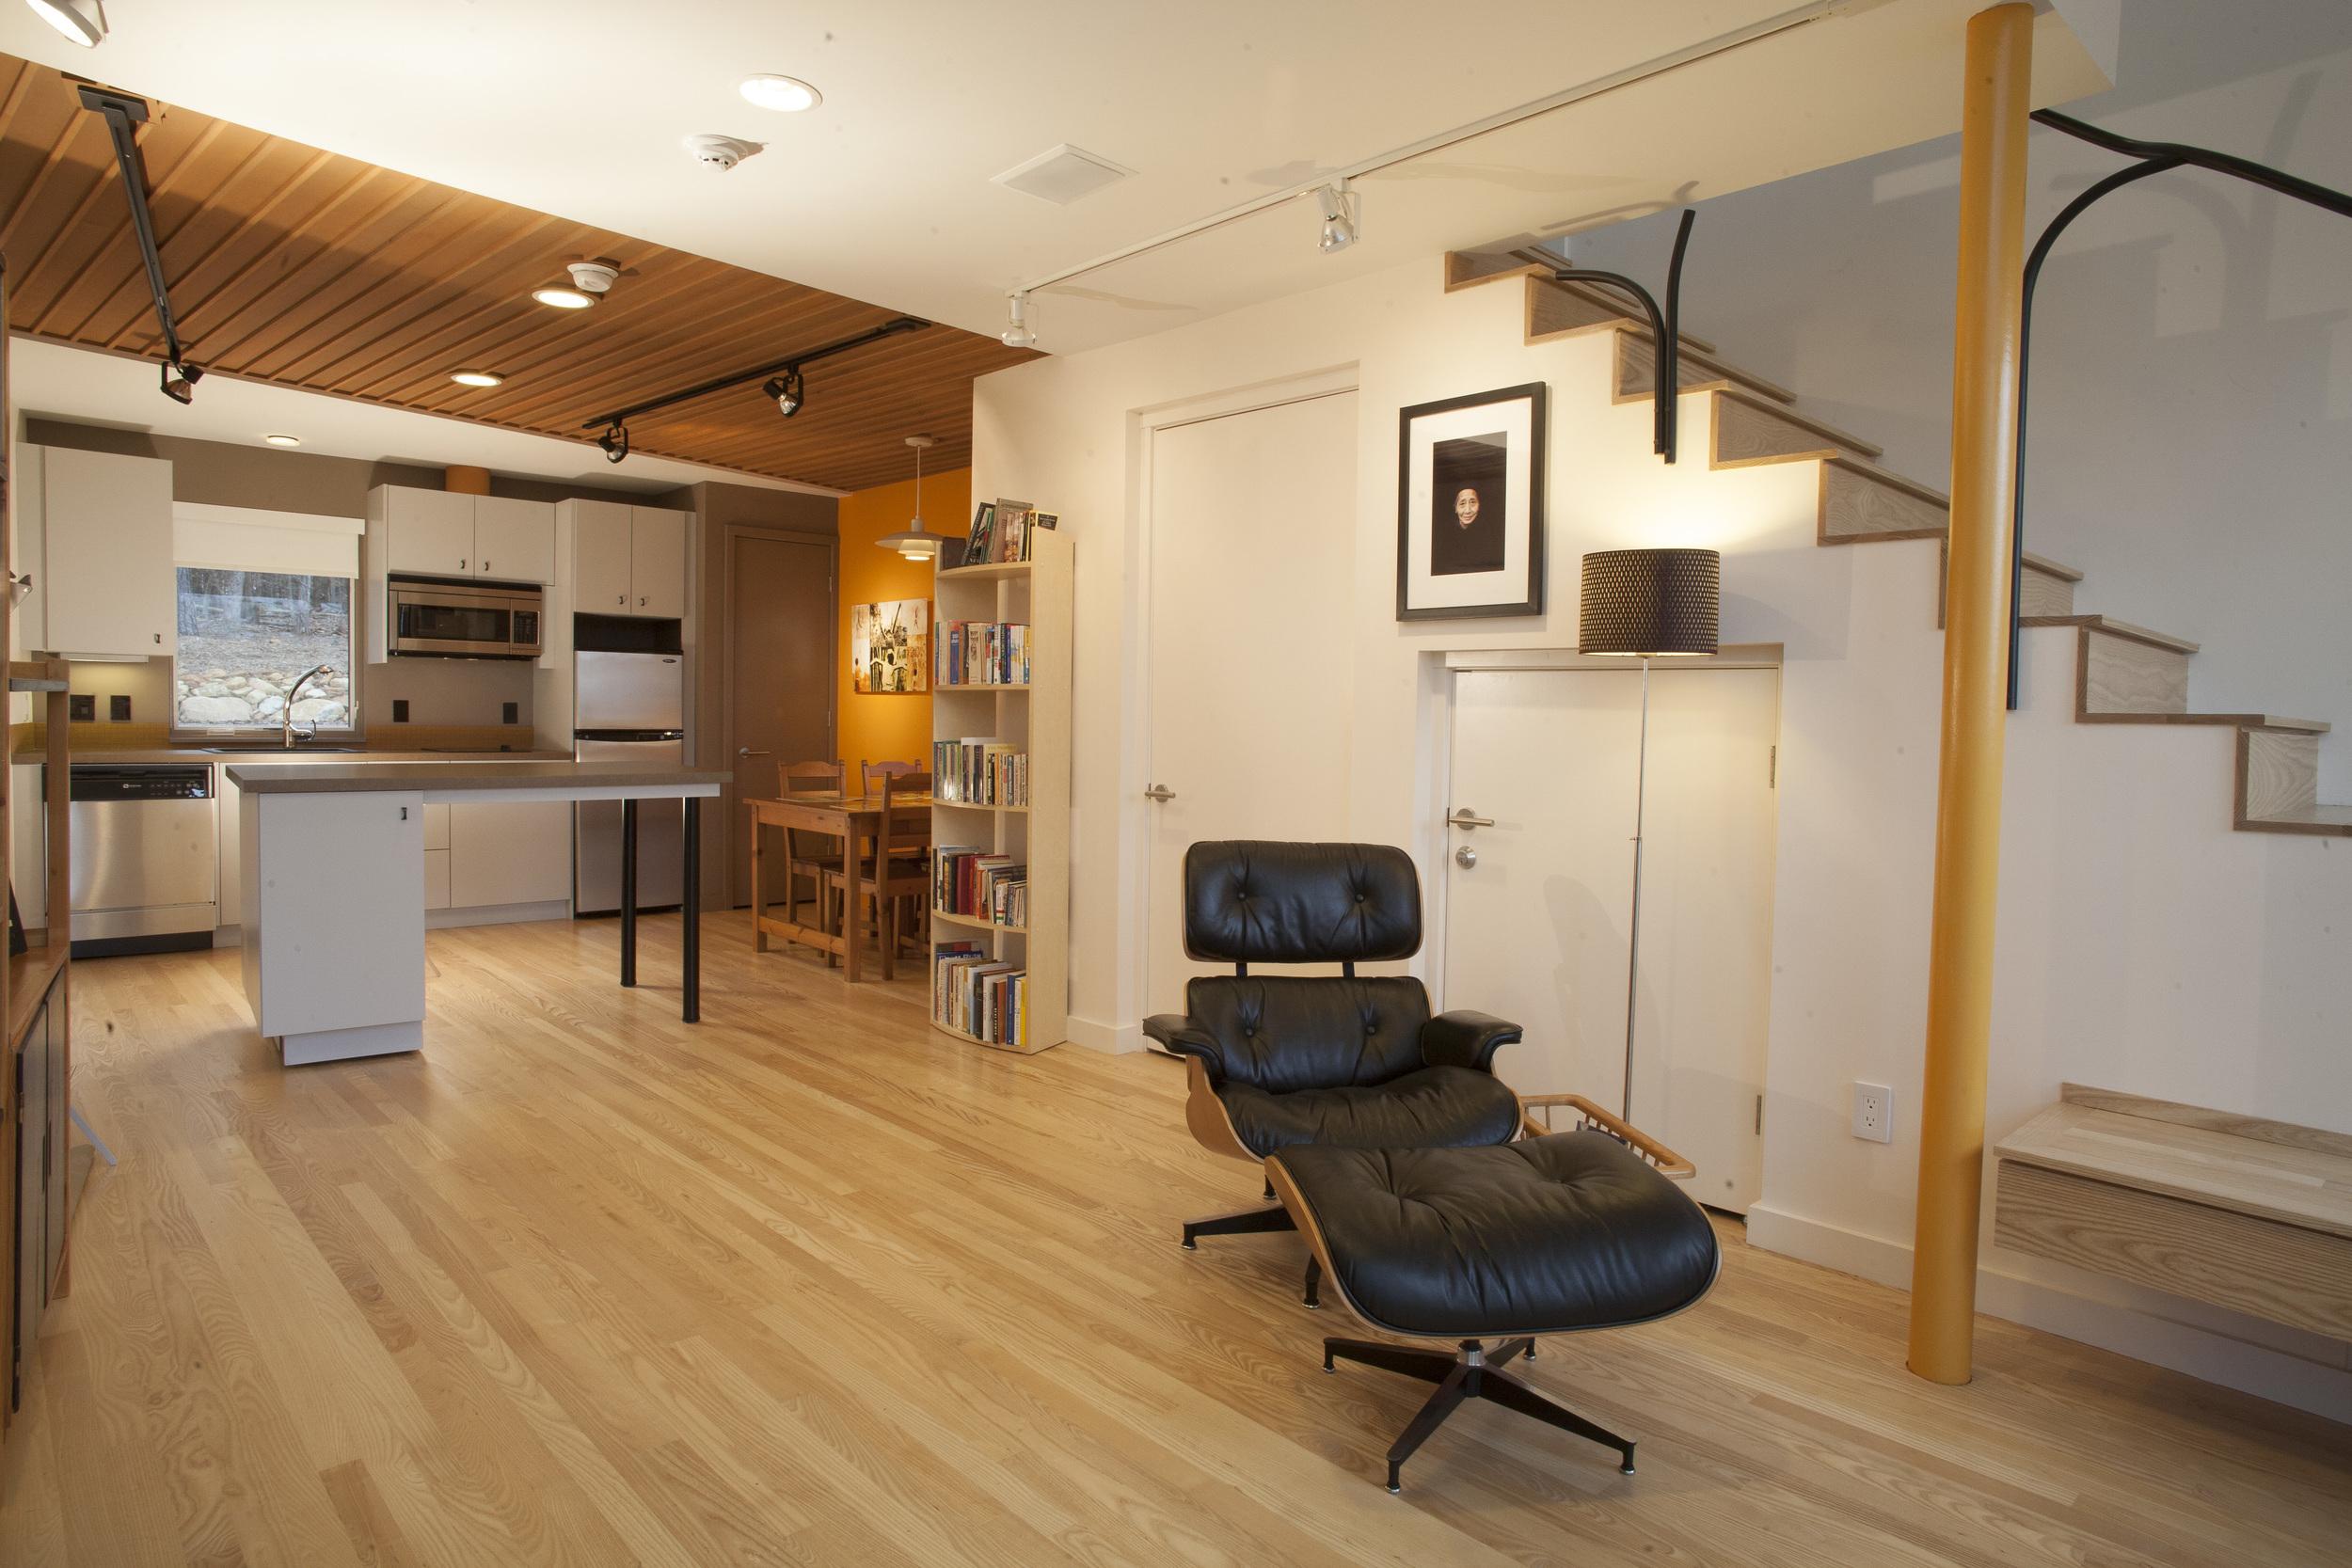 Cassilhaus Interior Artist Pod Studio from NE Raw.jpg